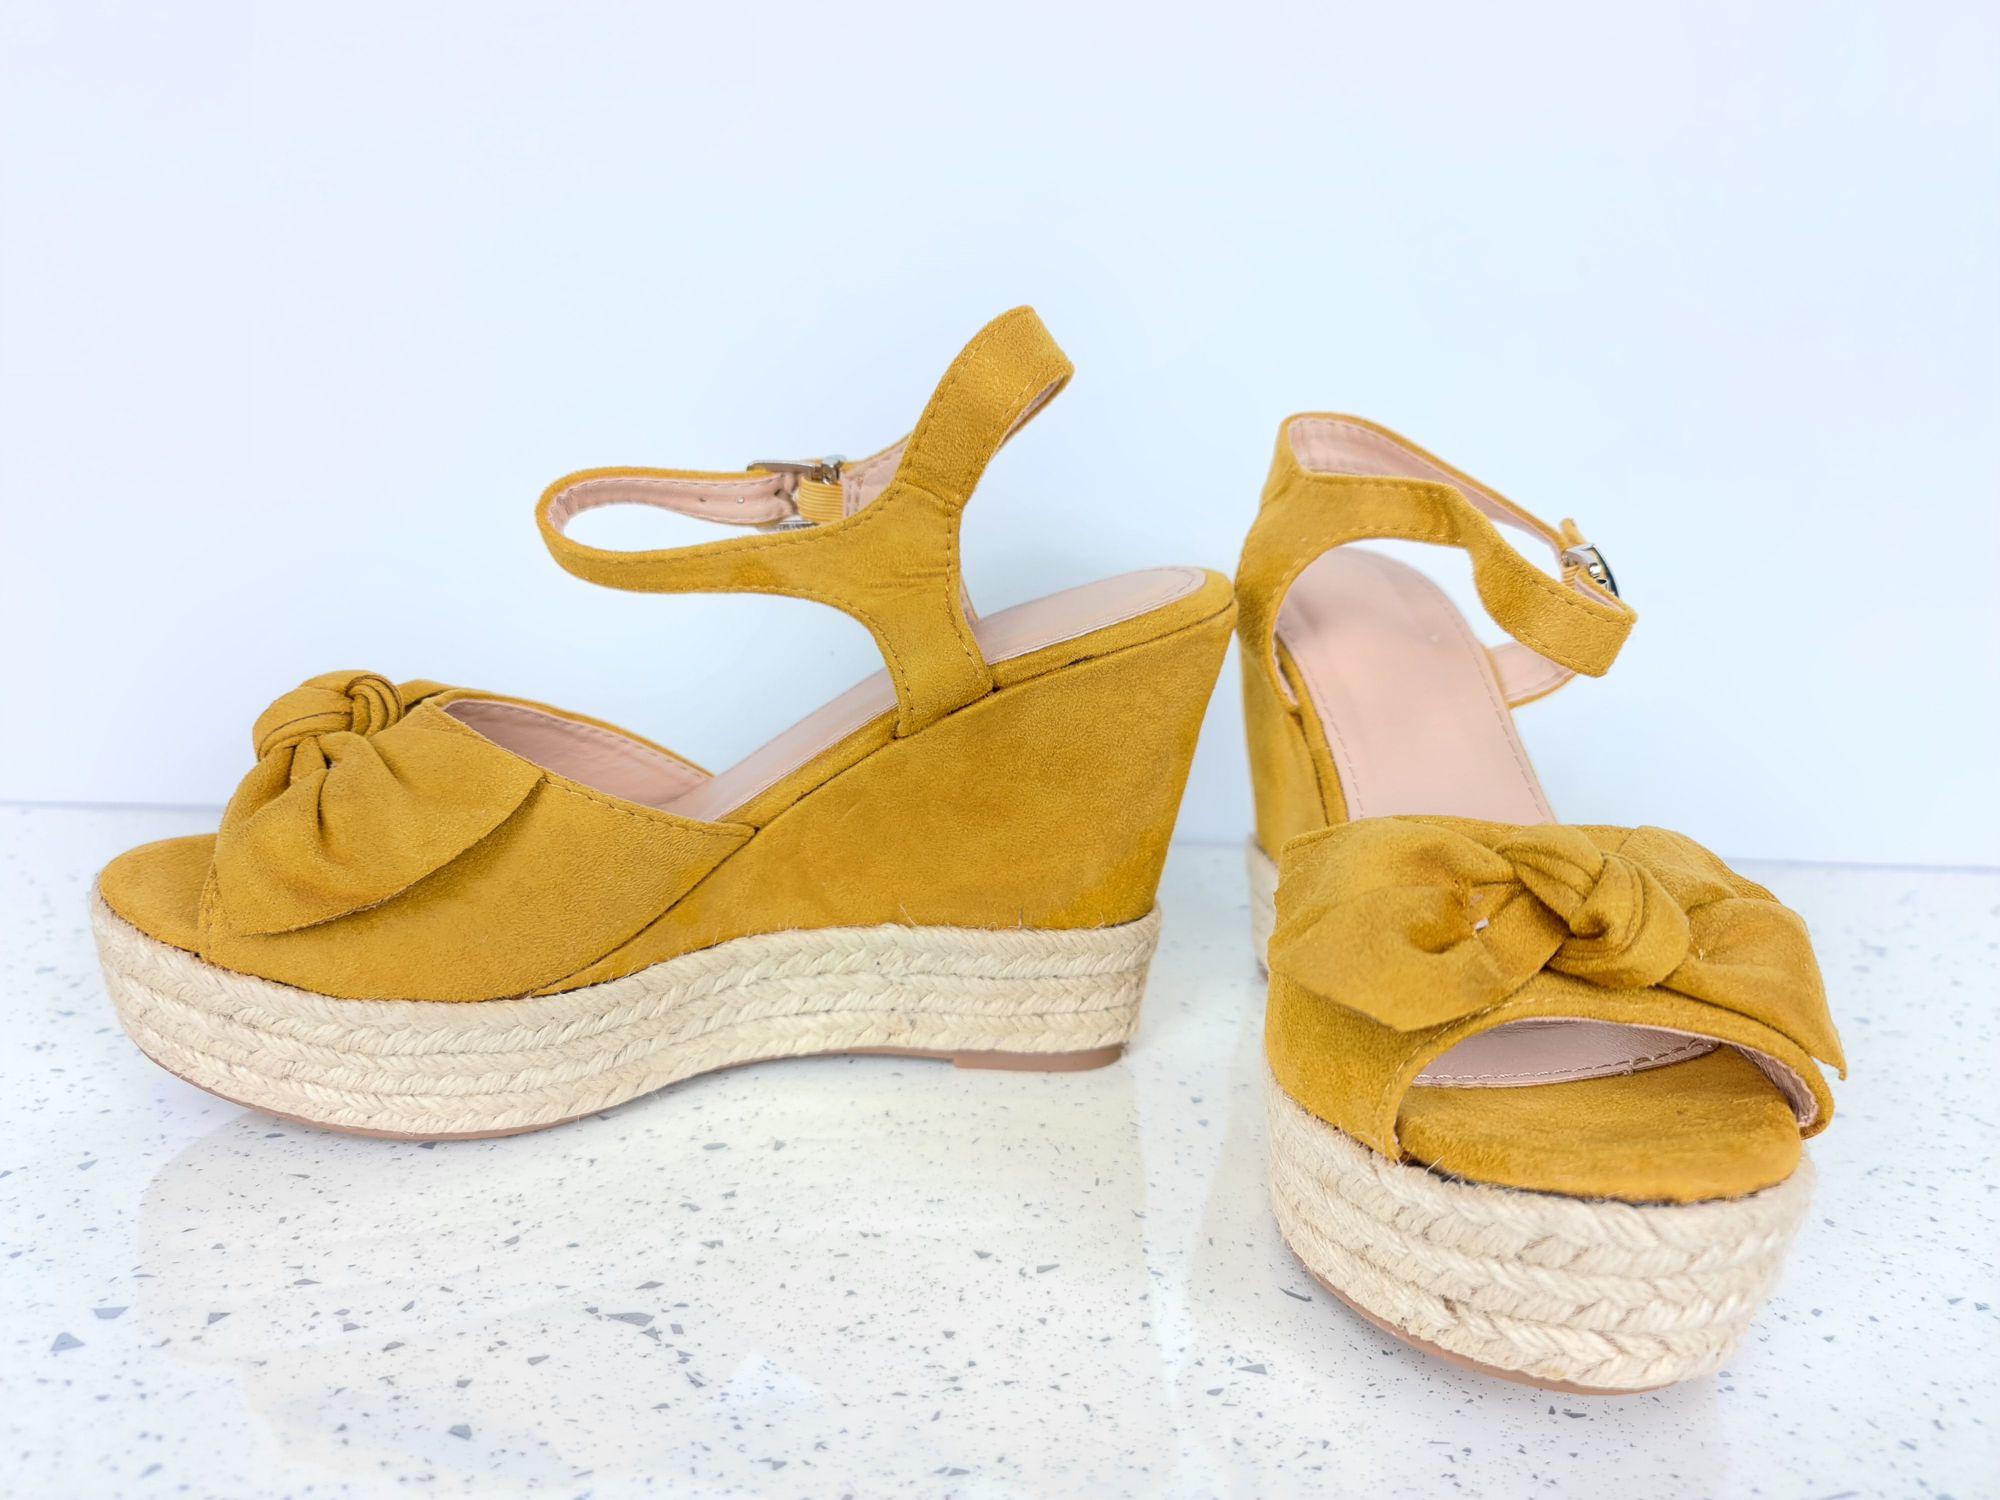 FPSHO001YELbbbb_sandales-wedge-nu-pieds-pinup-50-s-rockabilly-retro-nancy-moutarde